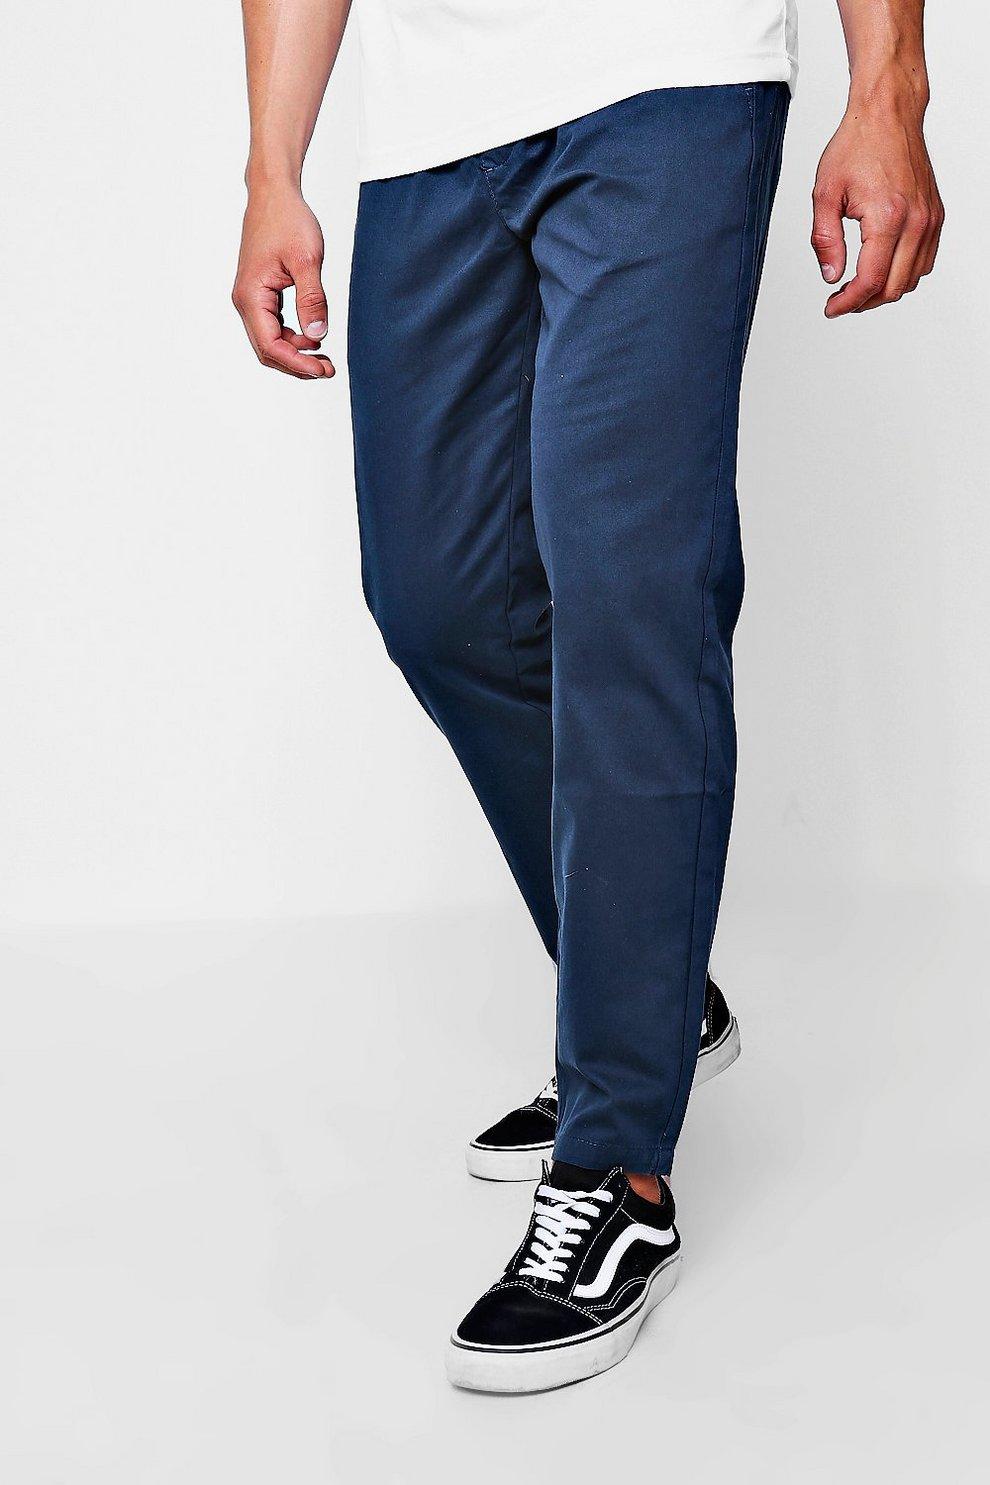 641203704c93 Navy Jogger Style Chino Trouser   Boohoo